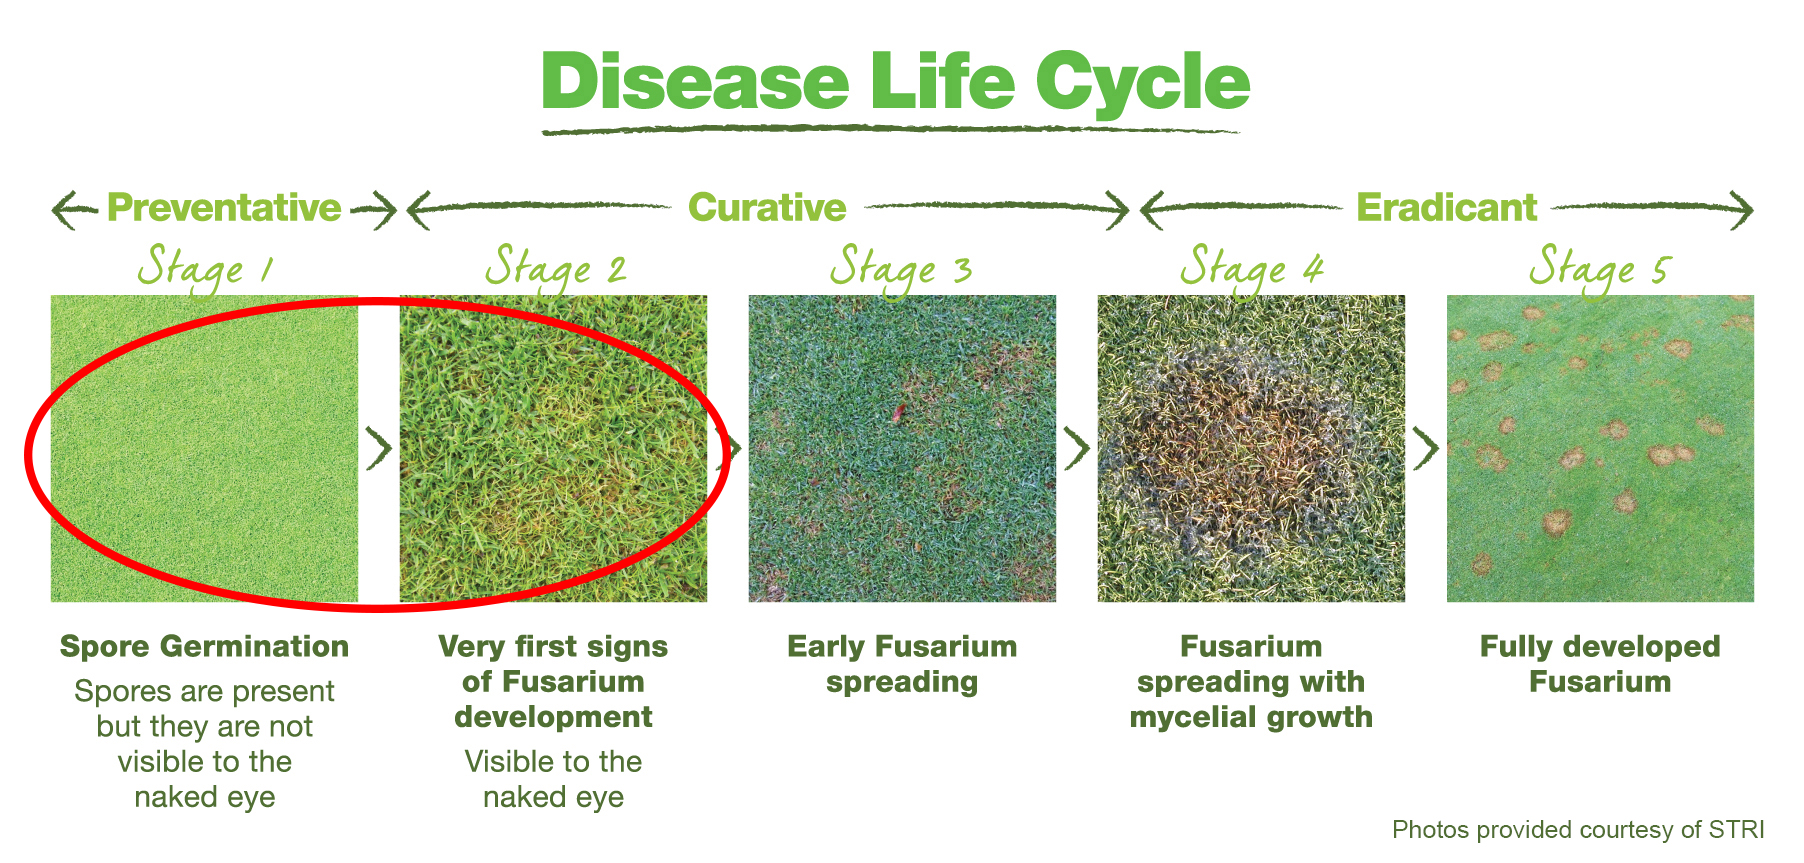 Disease Life Cycle of Fusarium